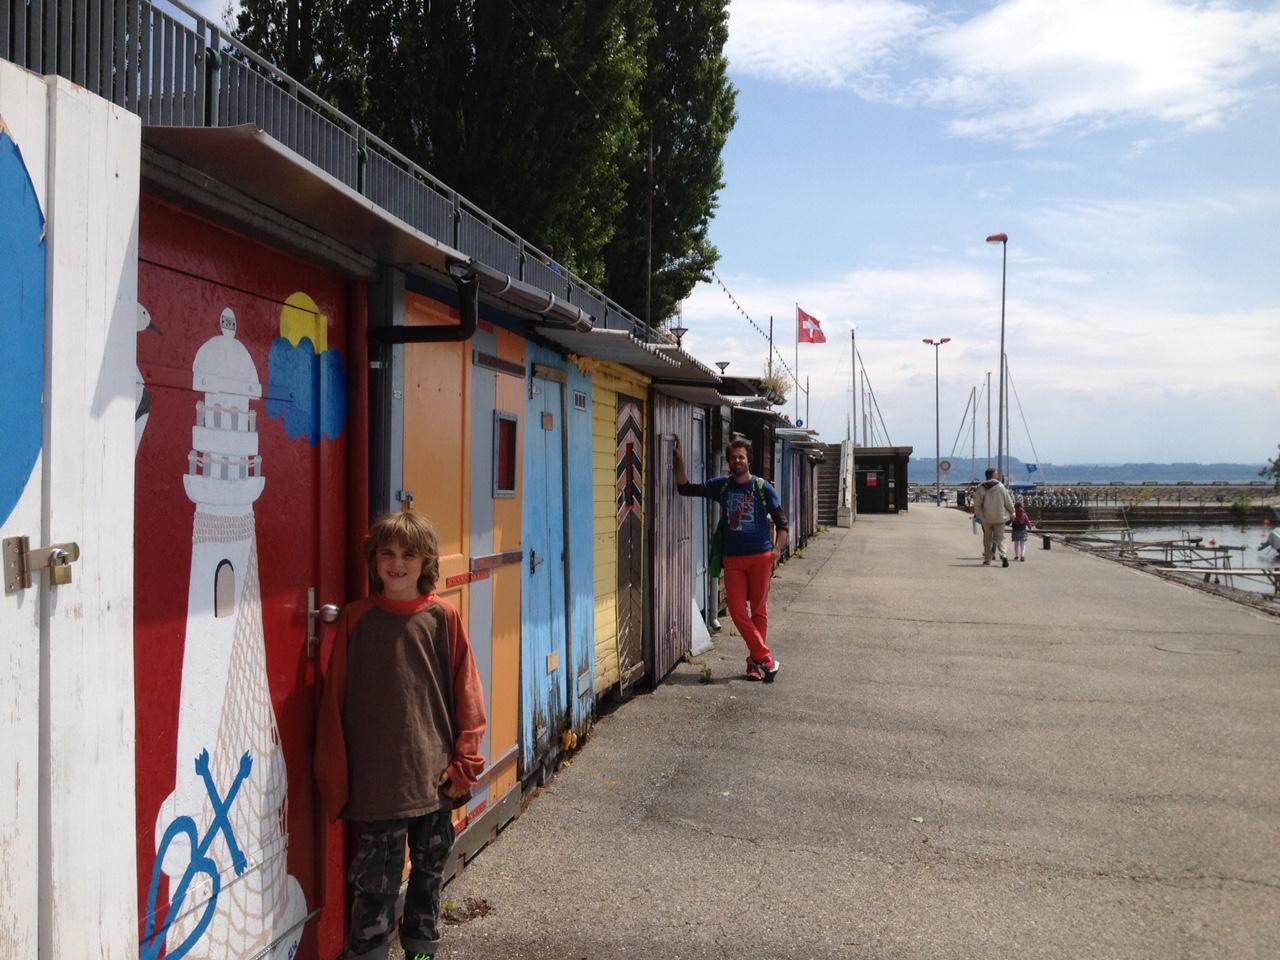 casas pescadores neuchatel suiza dejavutravelpr